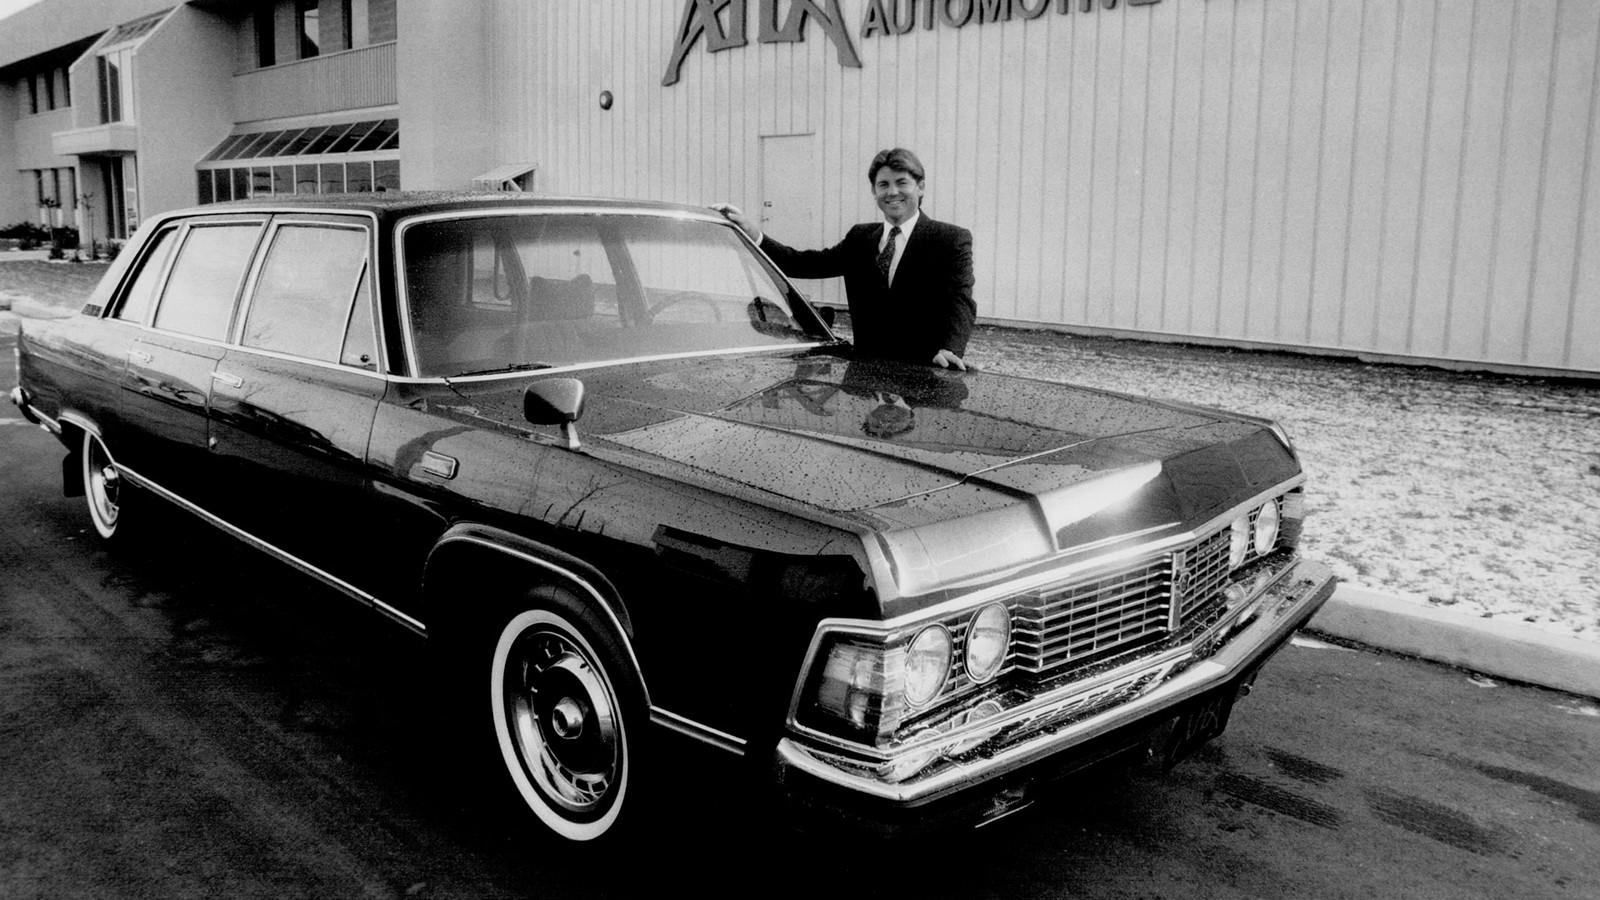 «Канадский след»: ГАЗ-13 возле здания компании AHА Automotive Technologies (Канада)